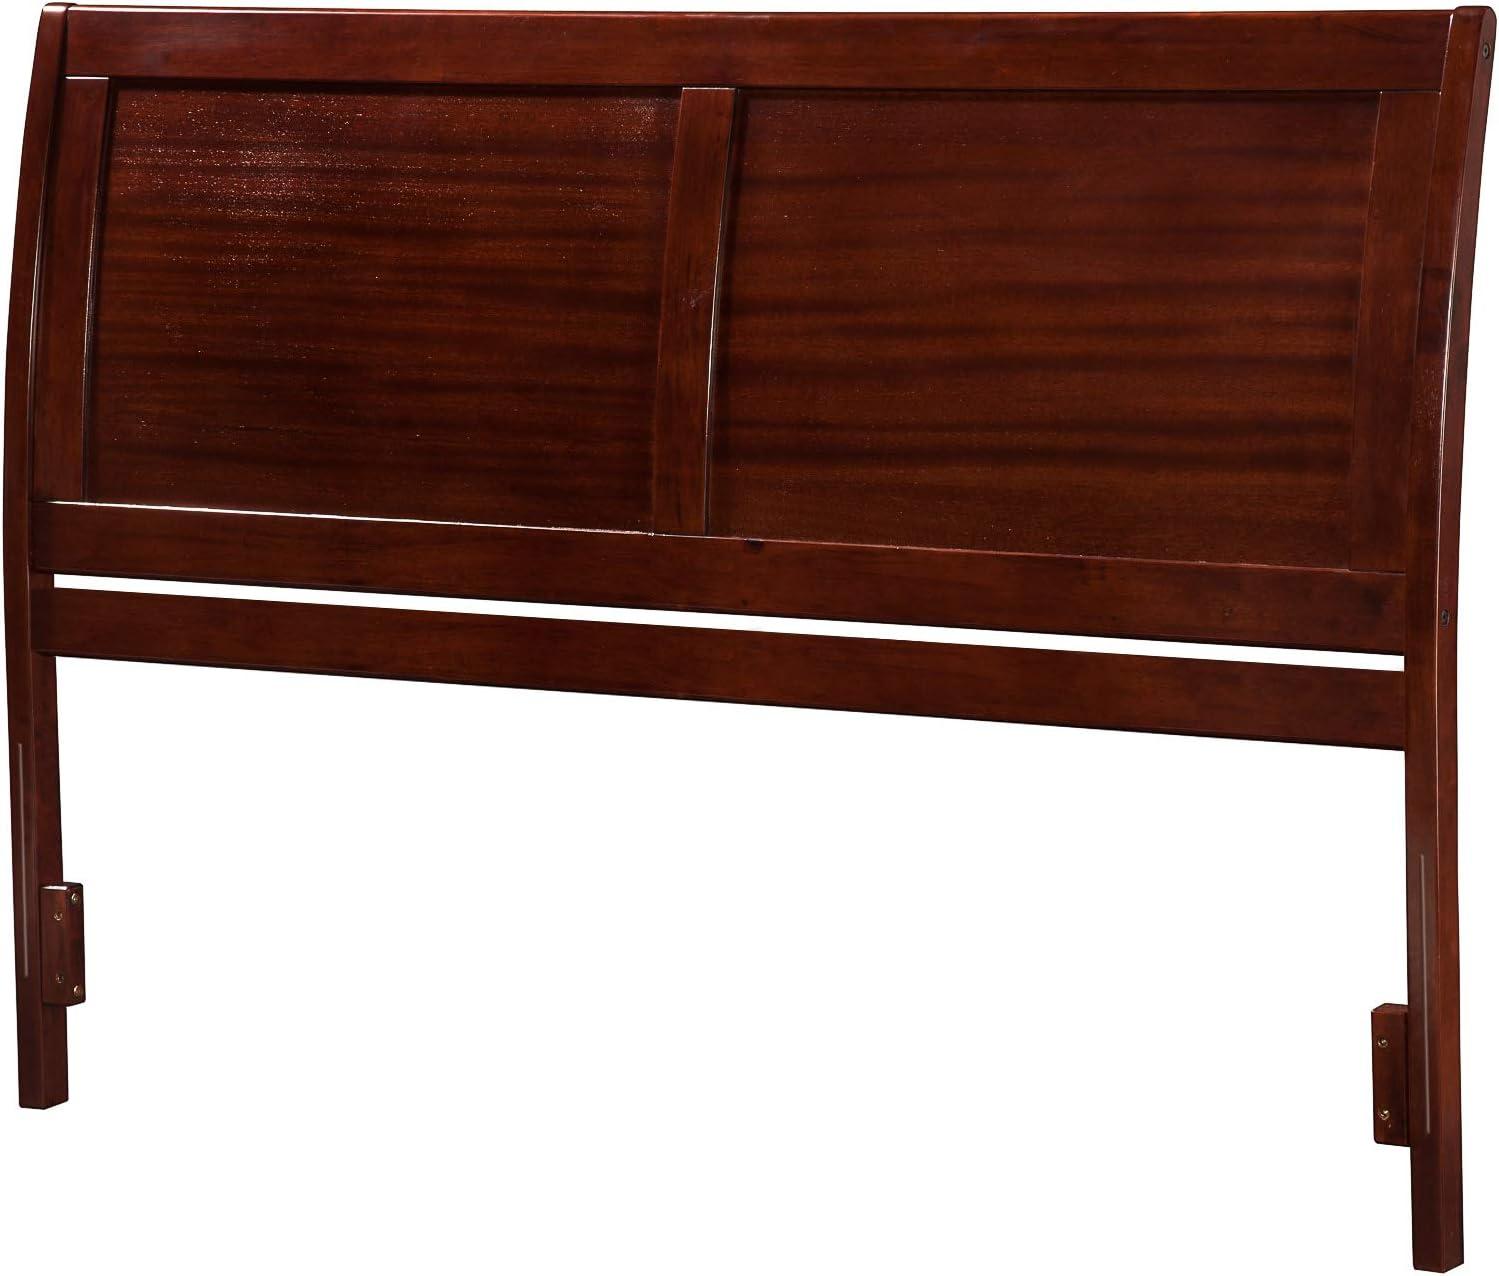 Atlantic Furniture AR289844 Portland Headboard, Queen, Walnut